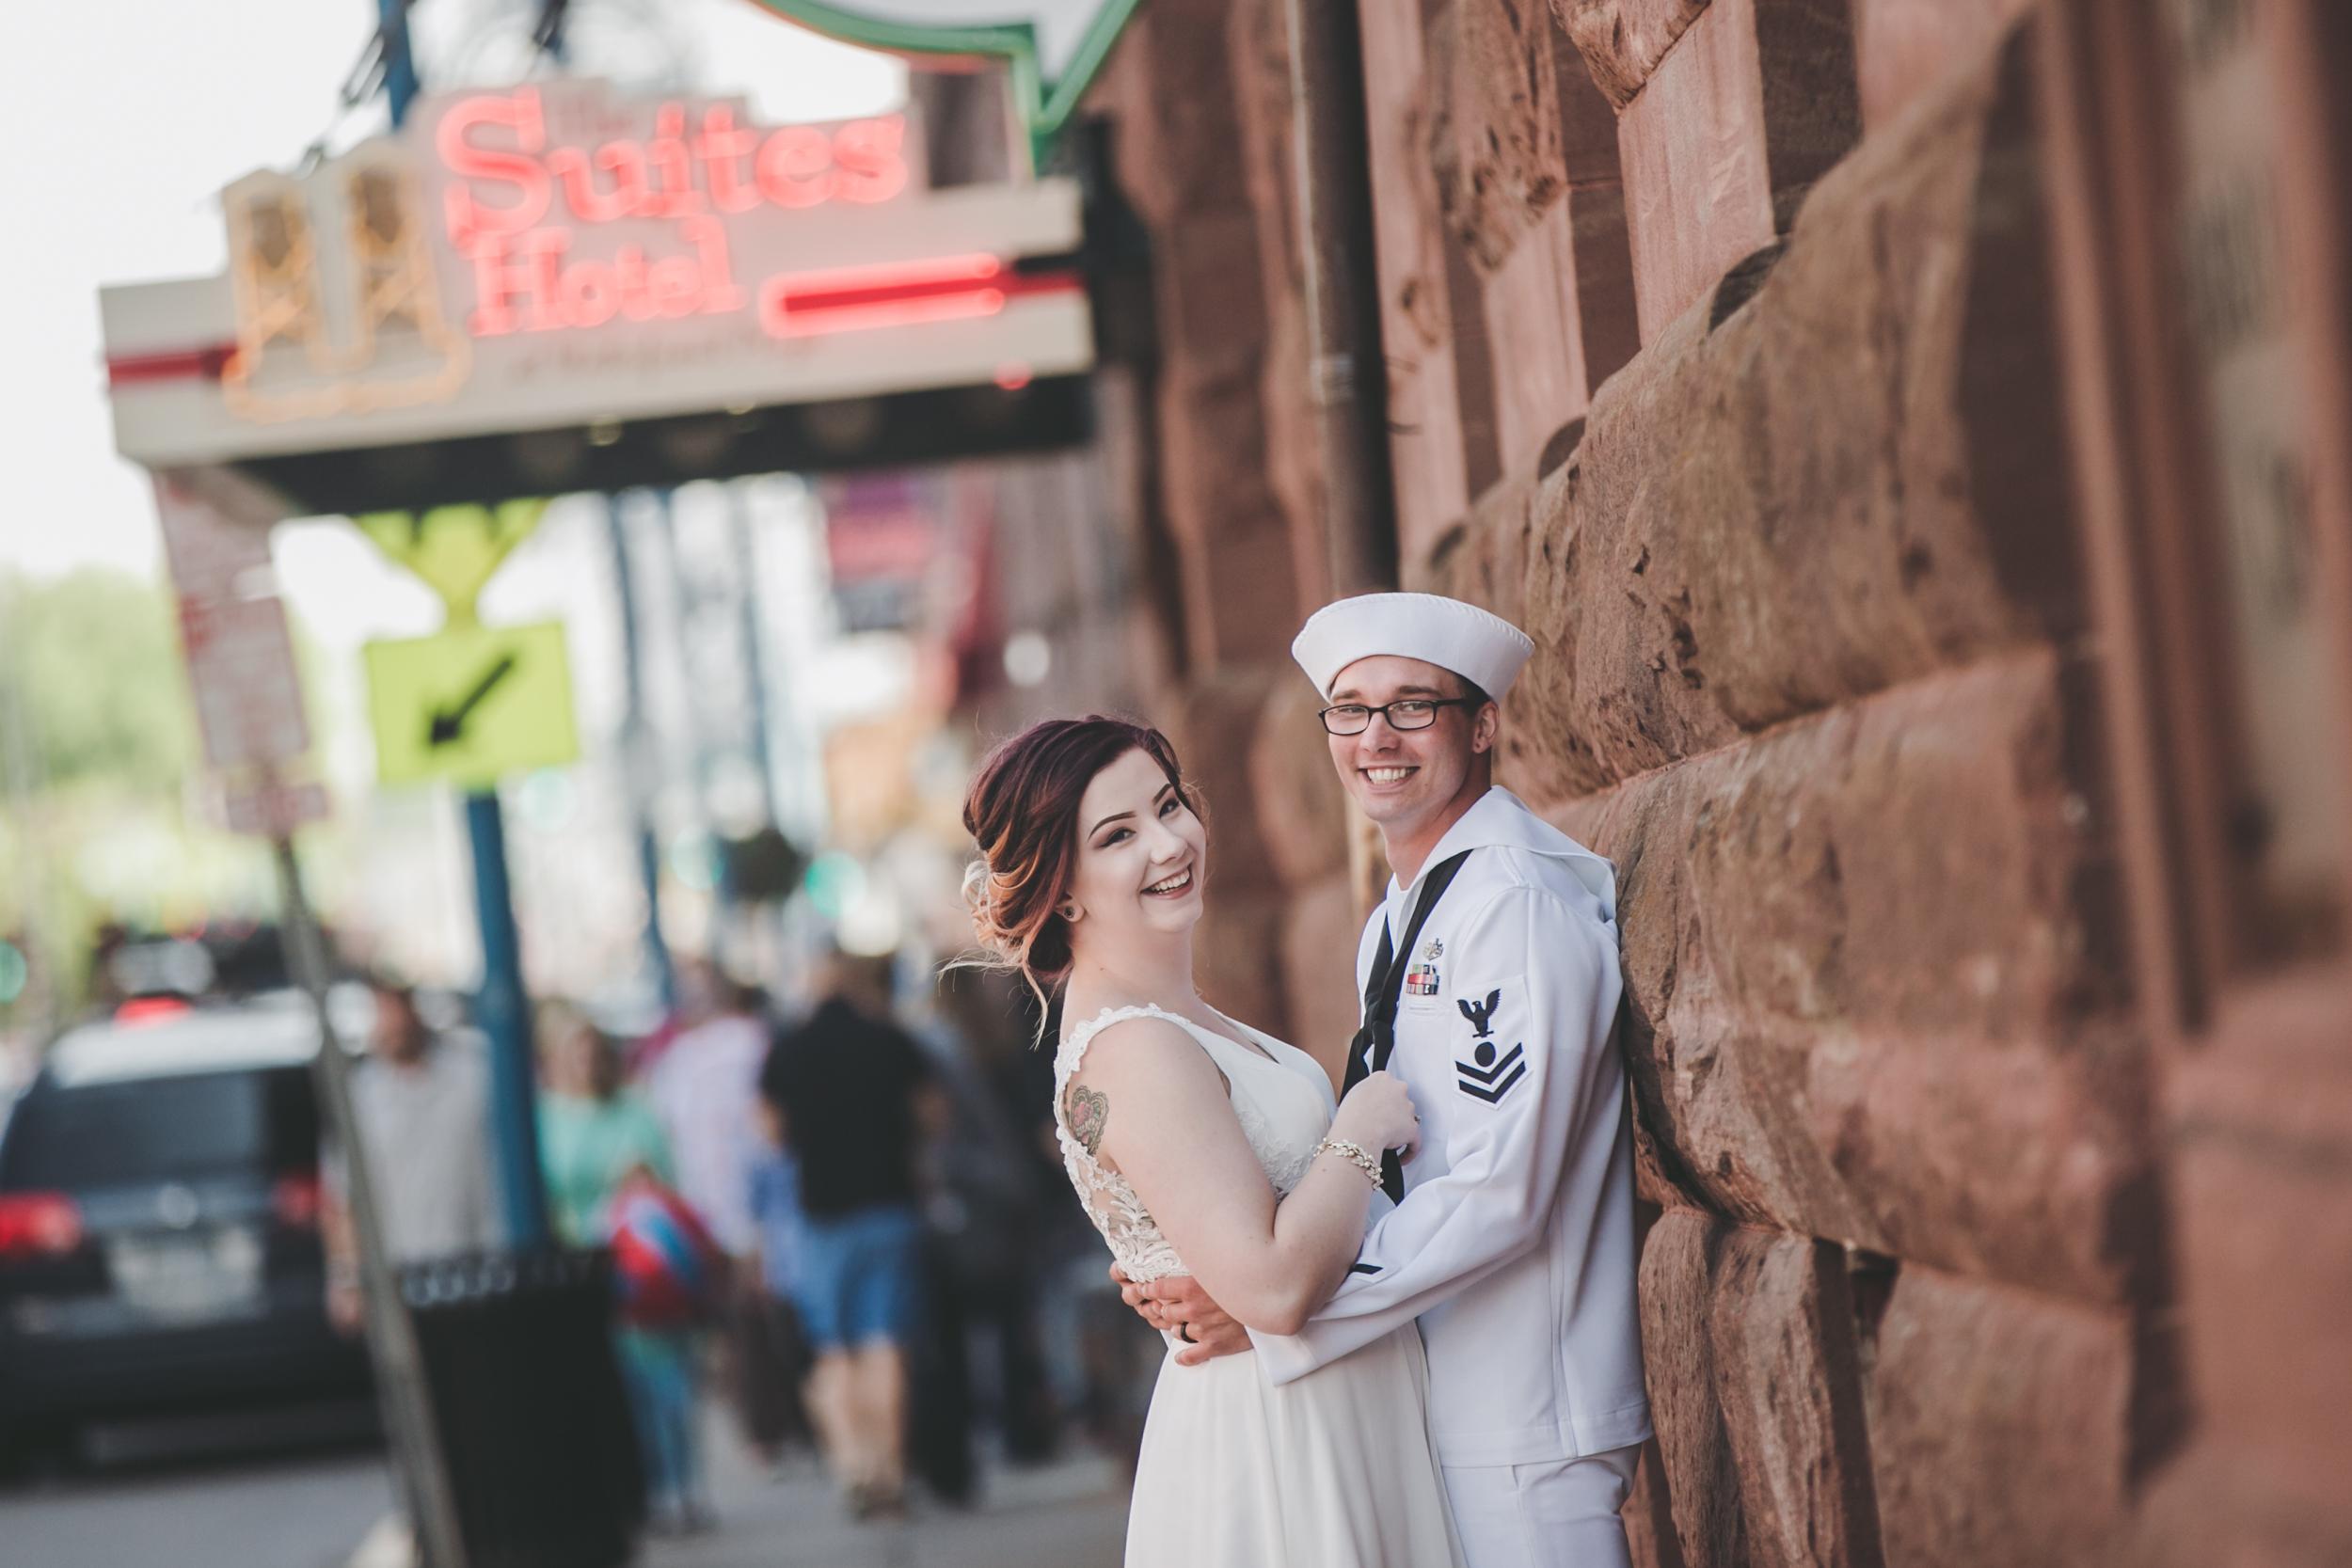 intimate elopement wedding, duluth mn, duluth mn elopement wedding, -www.rachelsmak.com28.jpg